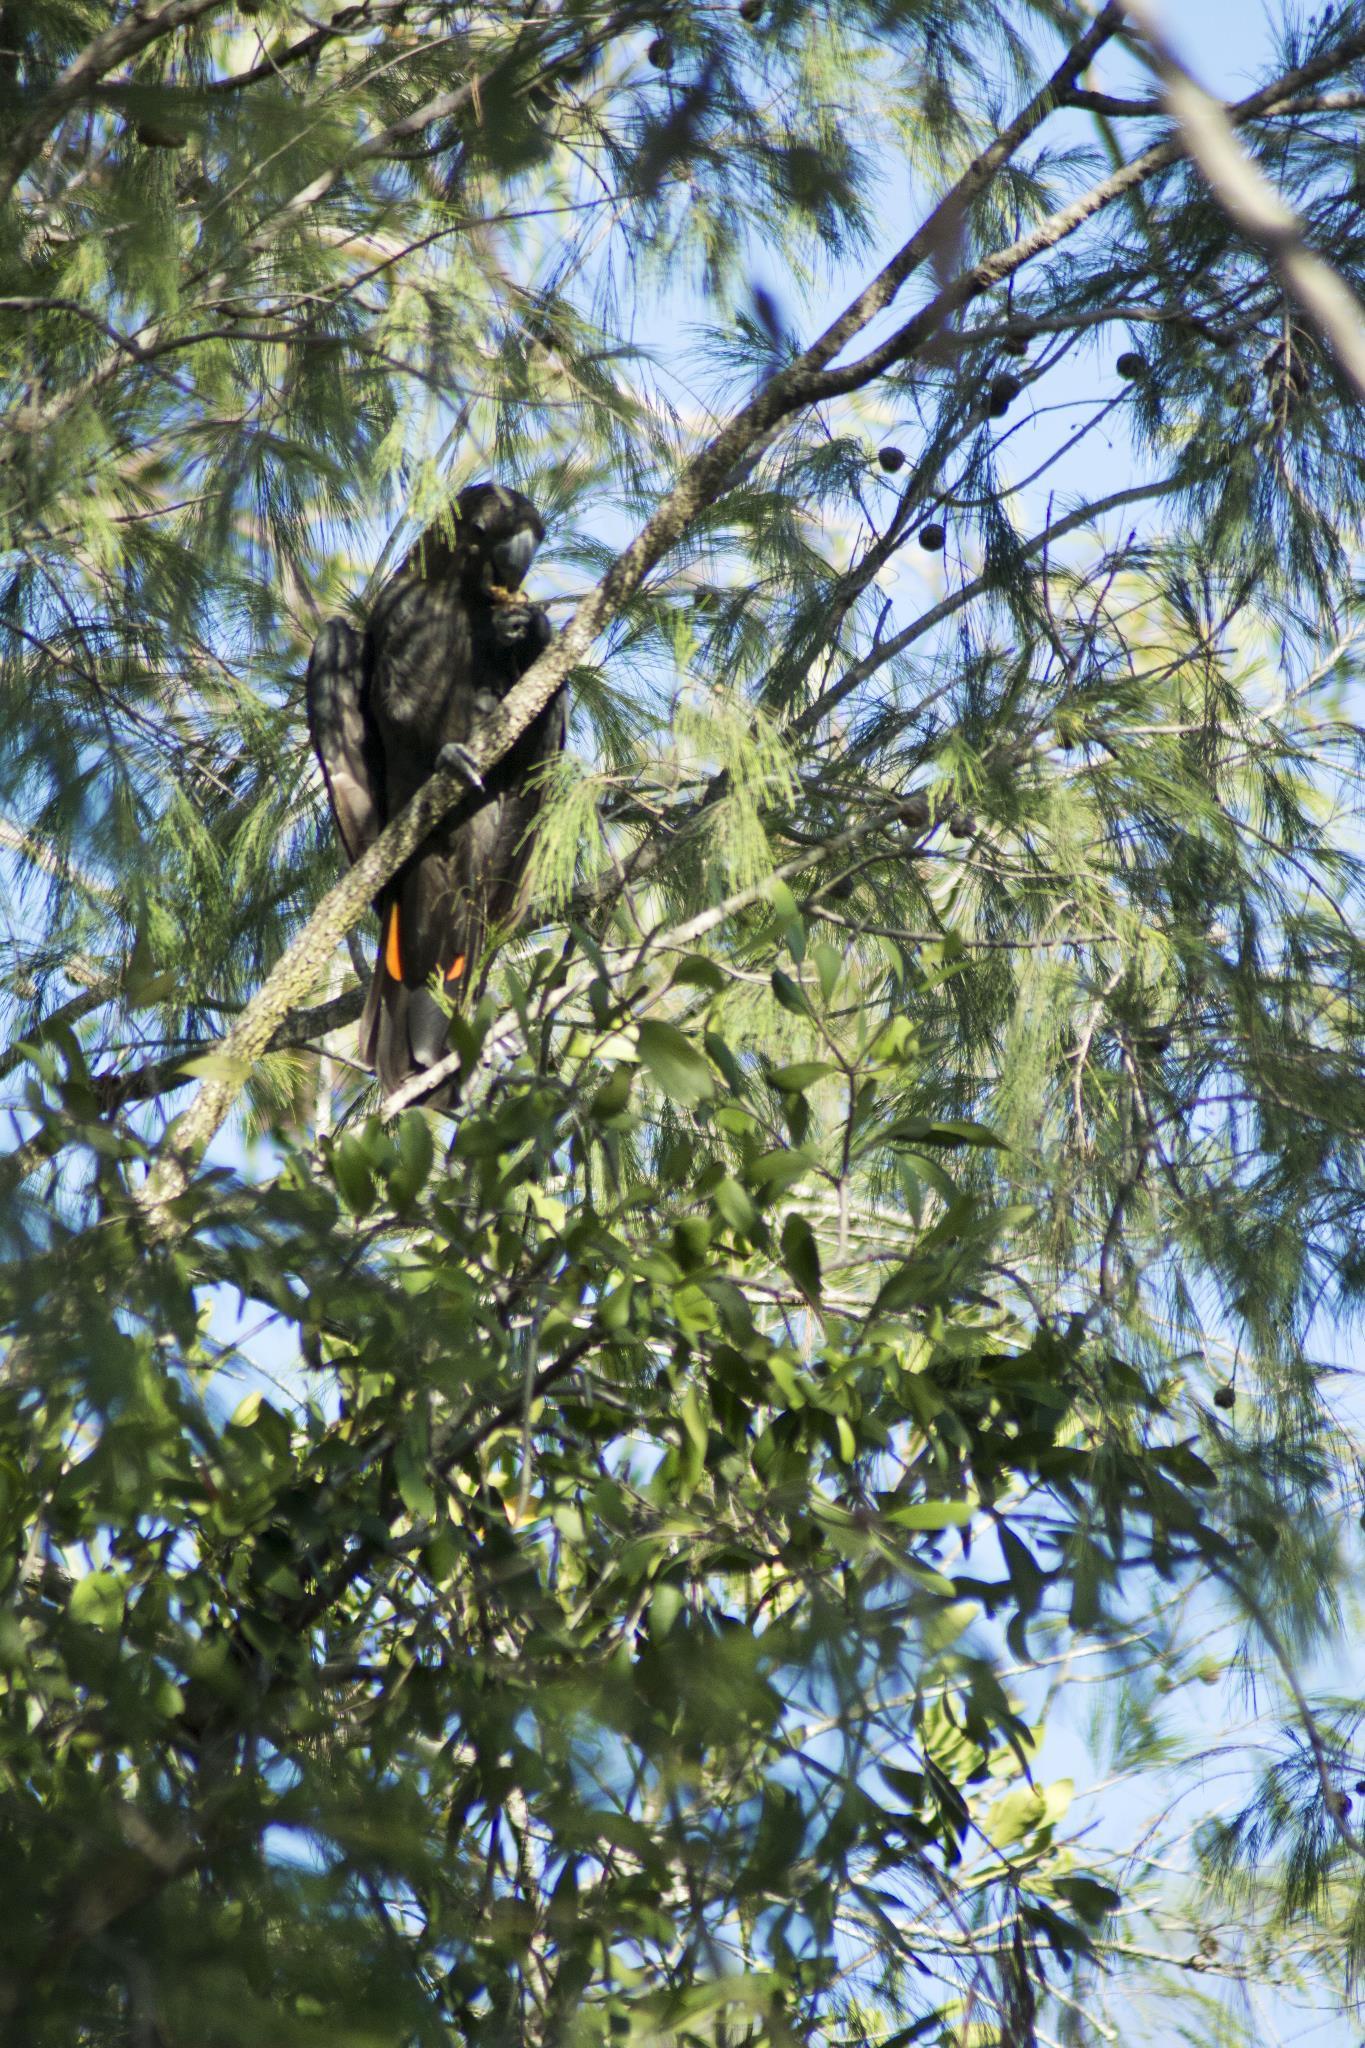 Glossy Black Cockatoo in a She Oak at the Nursery